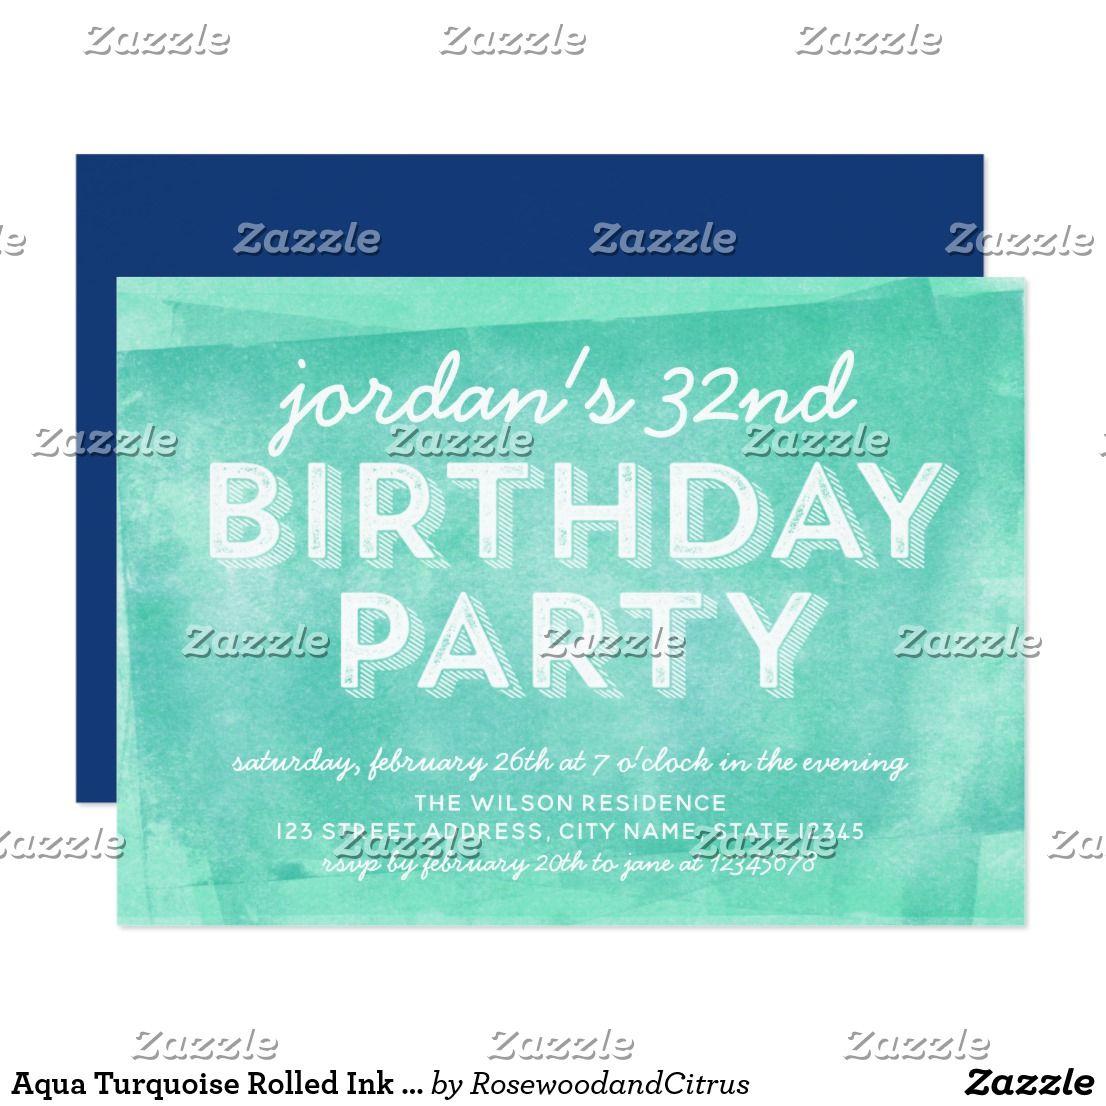 Aqua Turquoise Rolled Ink Any Age Birthday Invitation | Pinterest ...